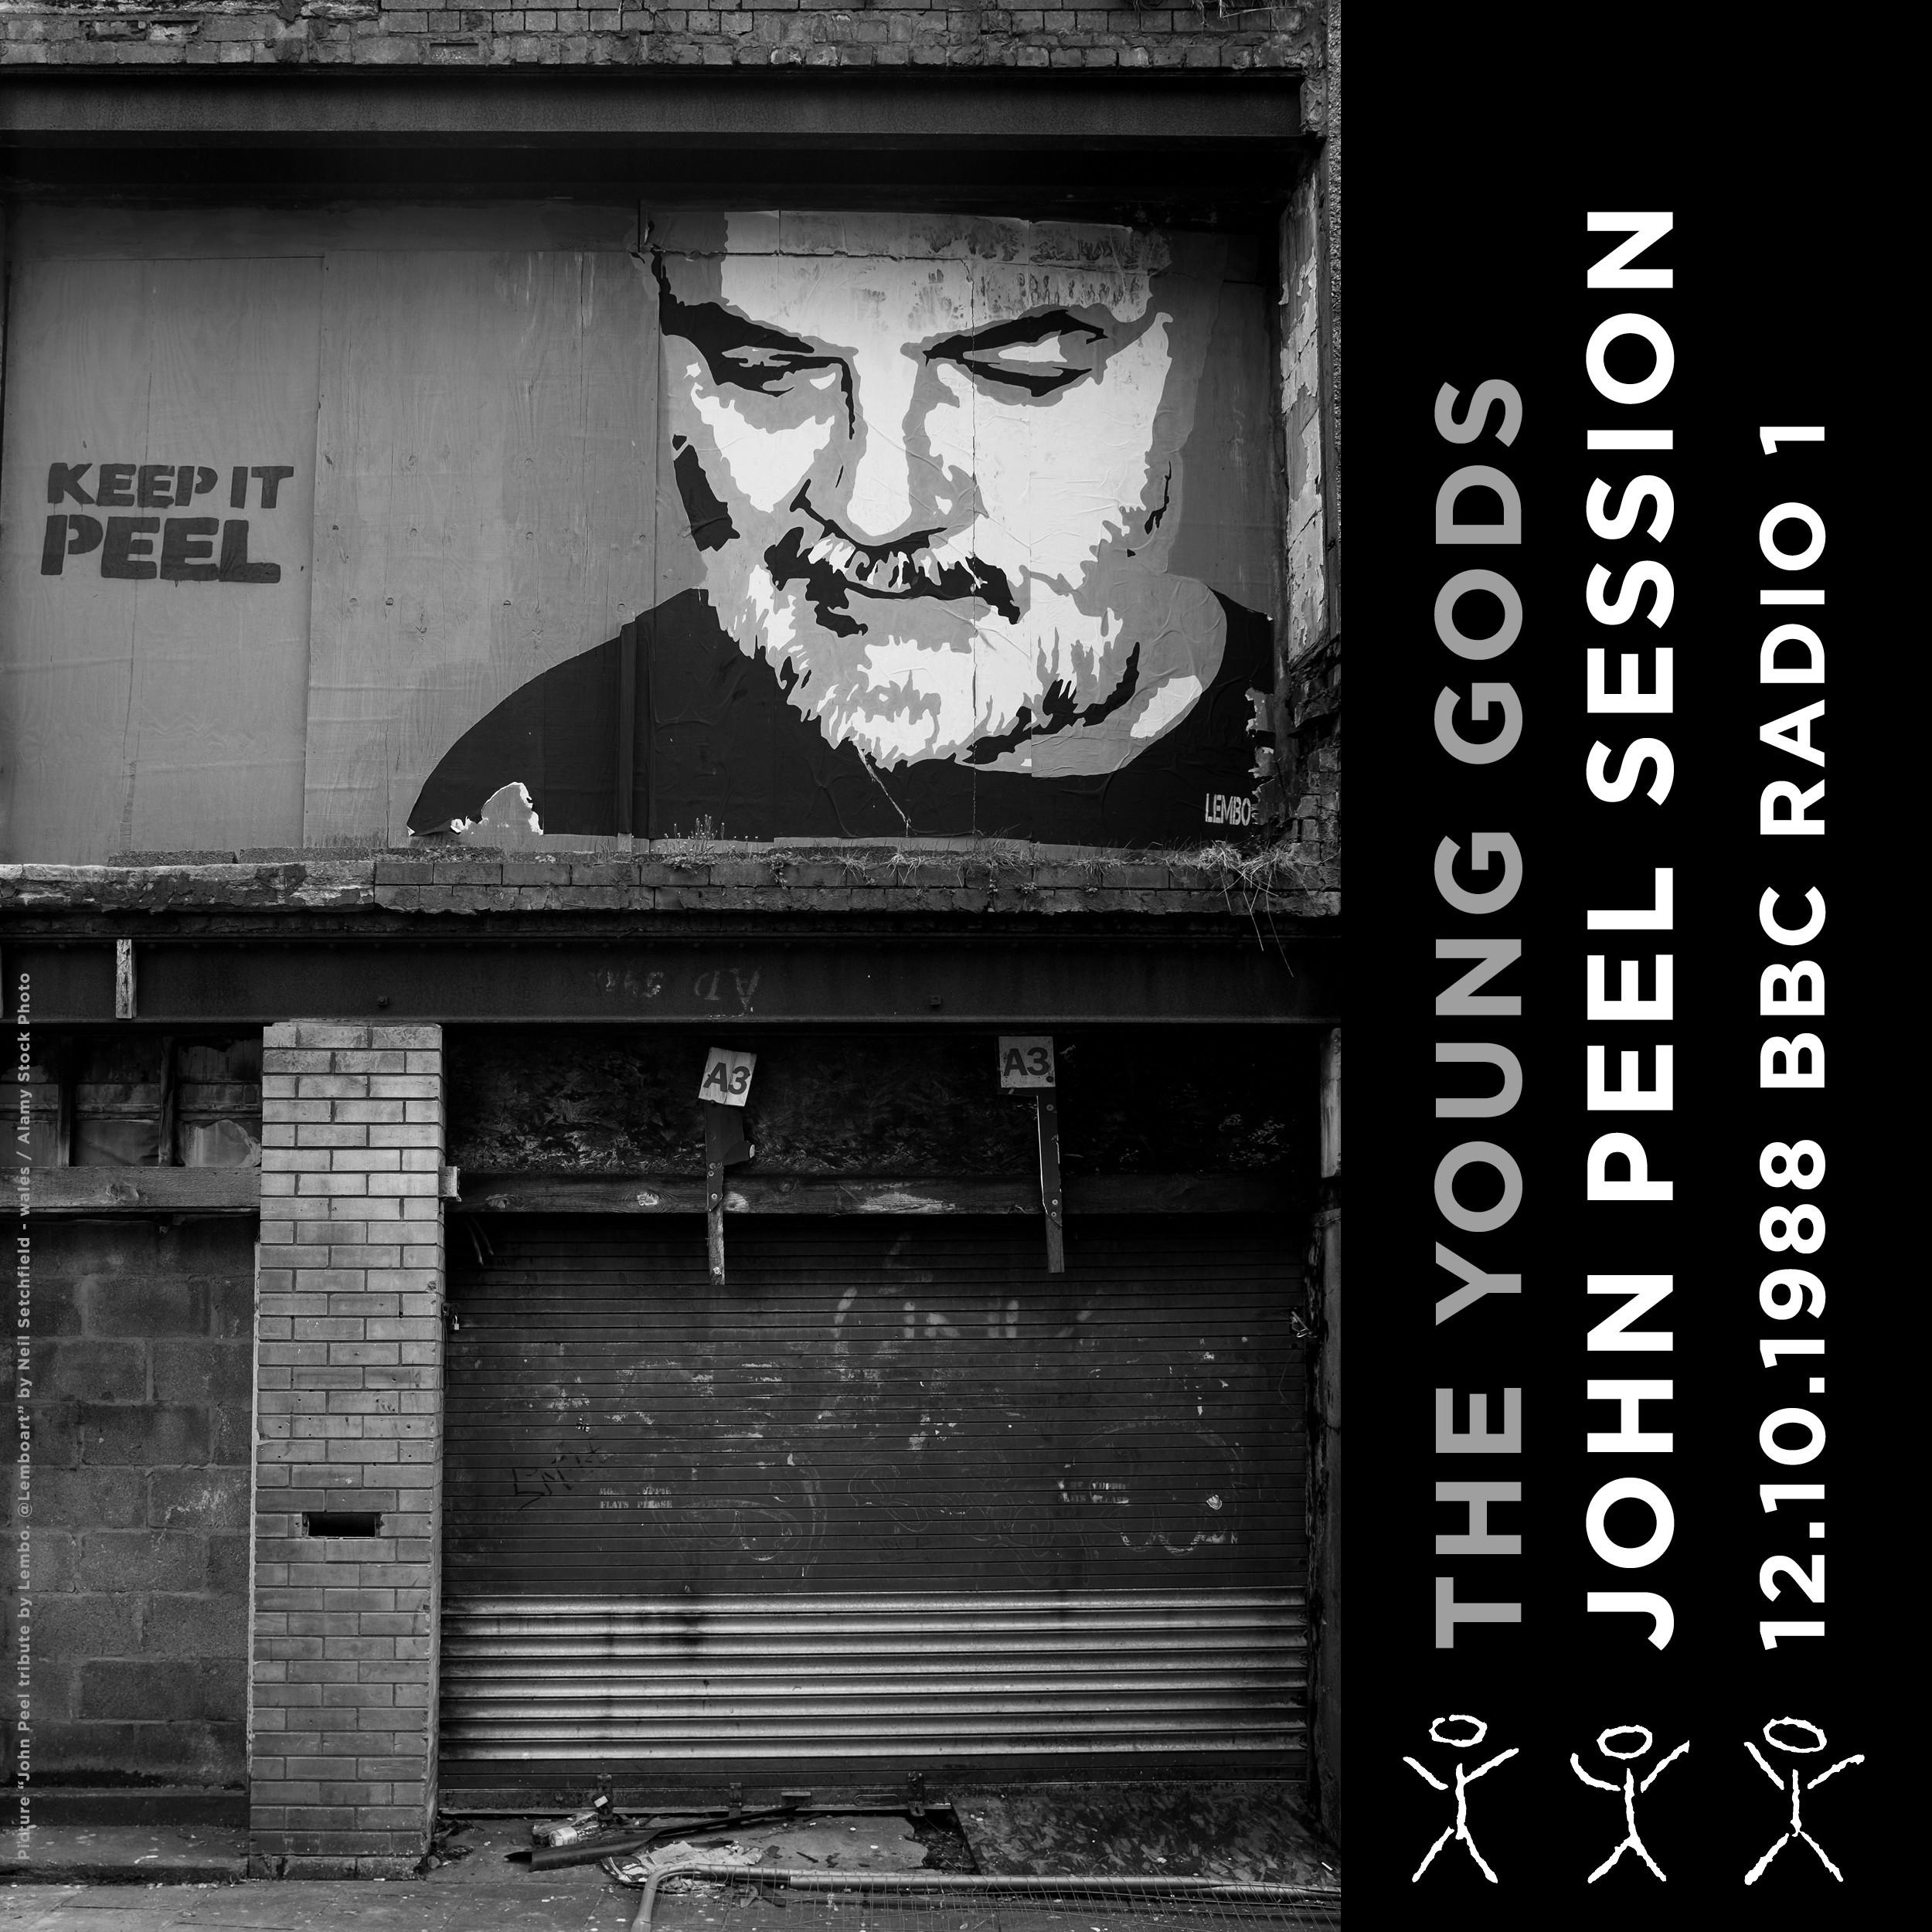 The Young Gods – John Peel Session 1988